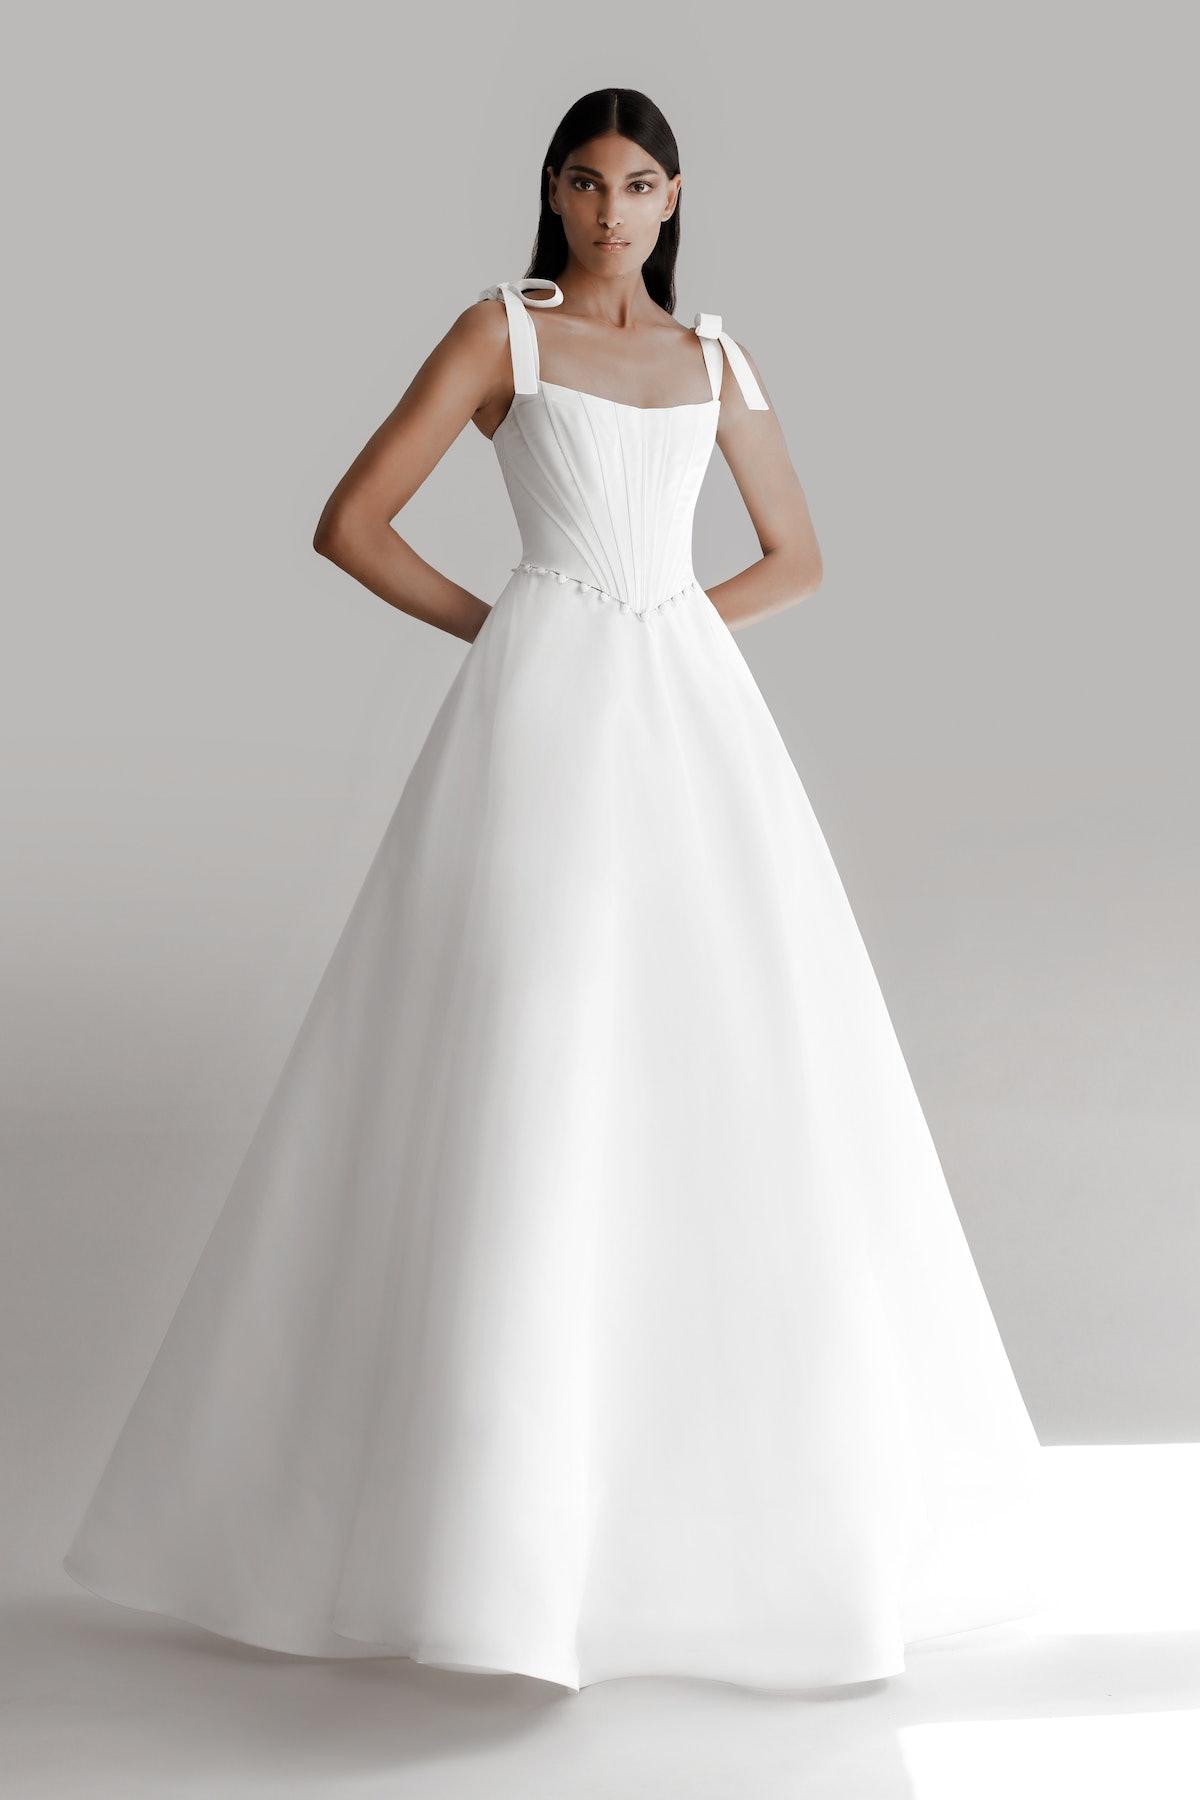 Model wears 2022 Prabal Gurung Bridal Collection